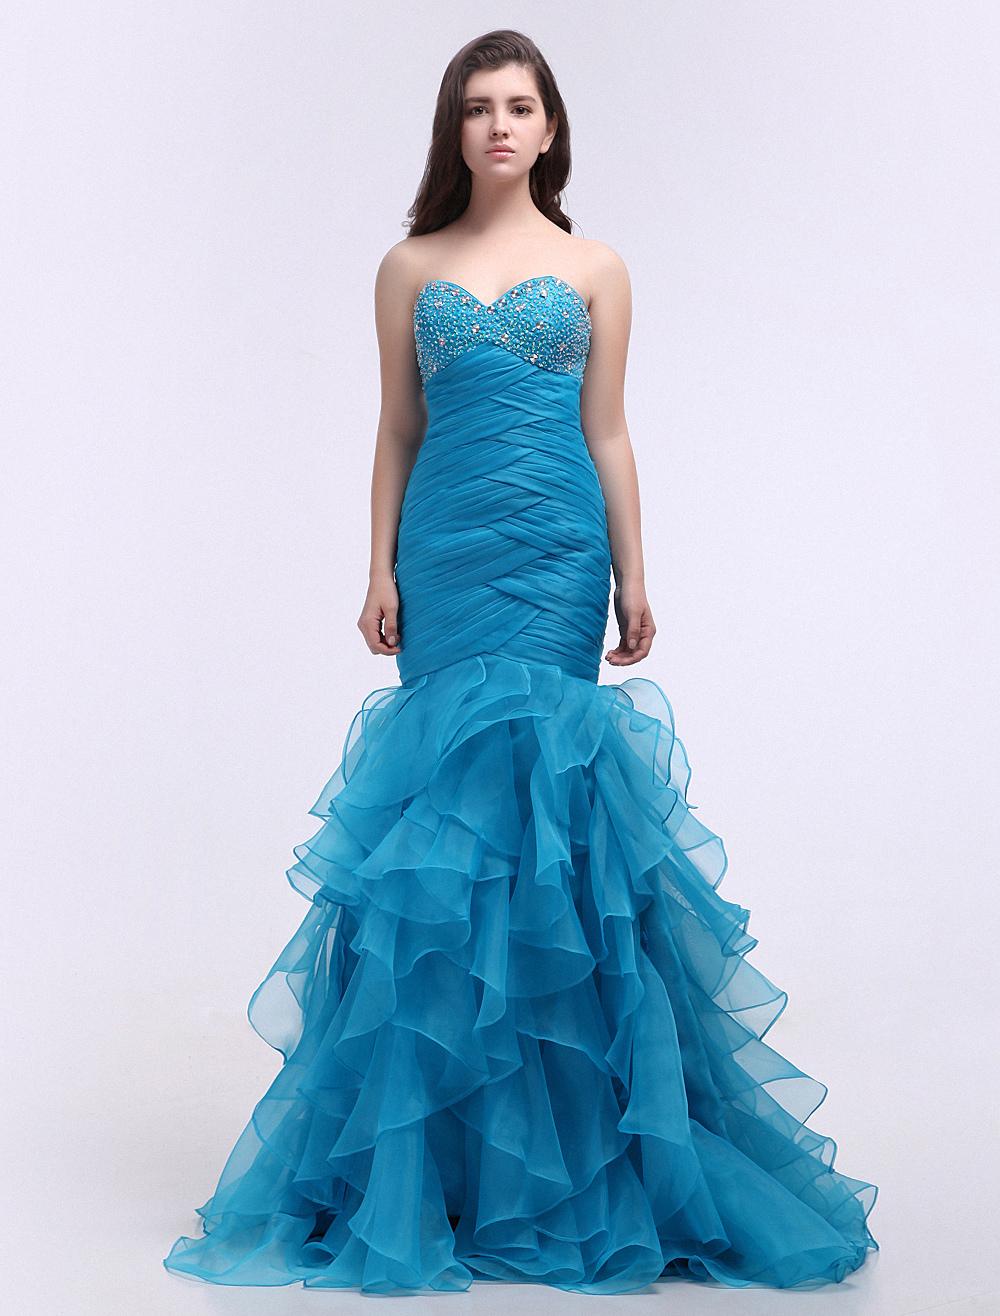 Style prom dress plus size buy trumpet mermaid style prom dress